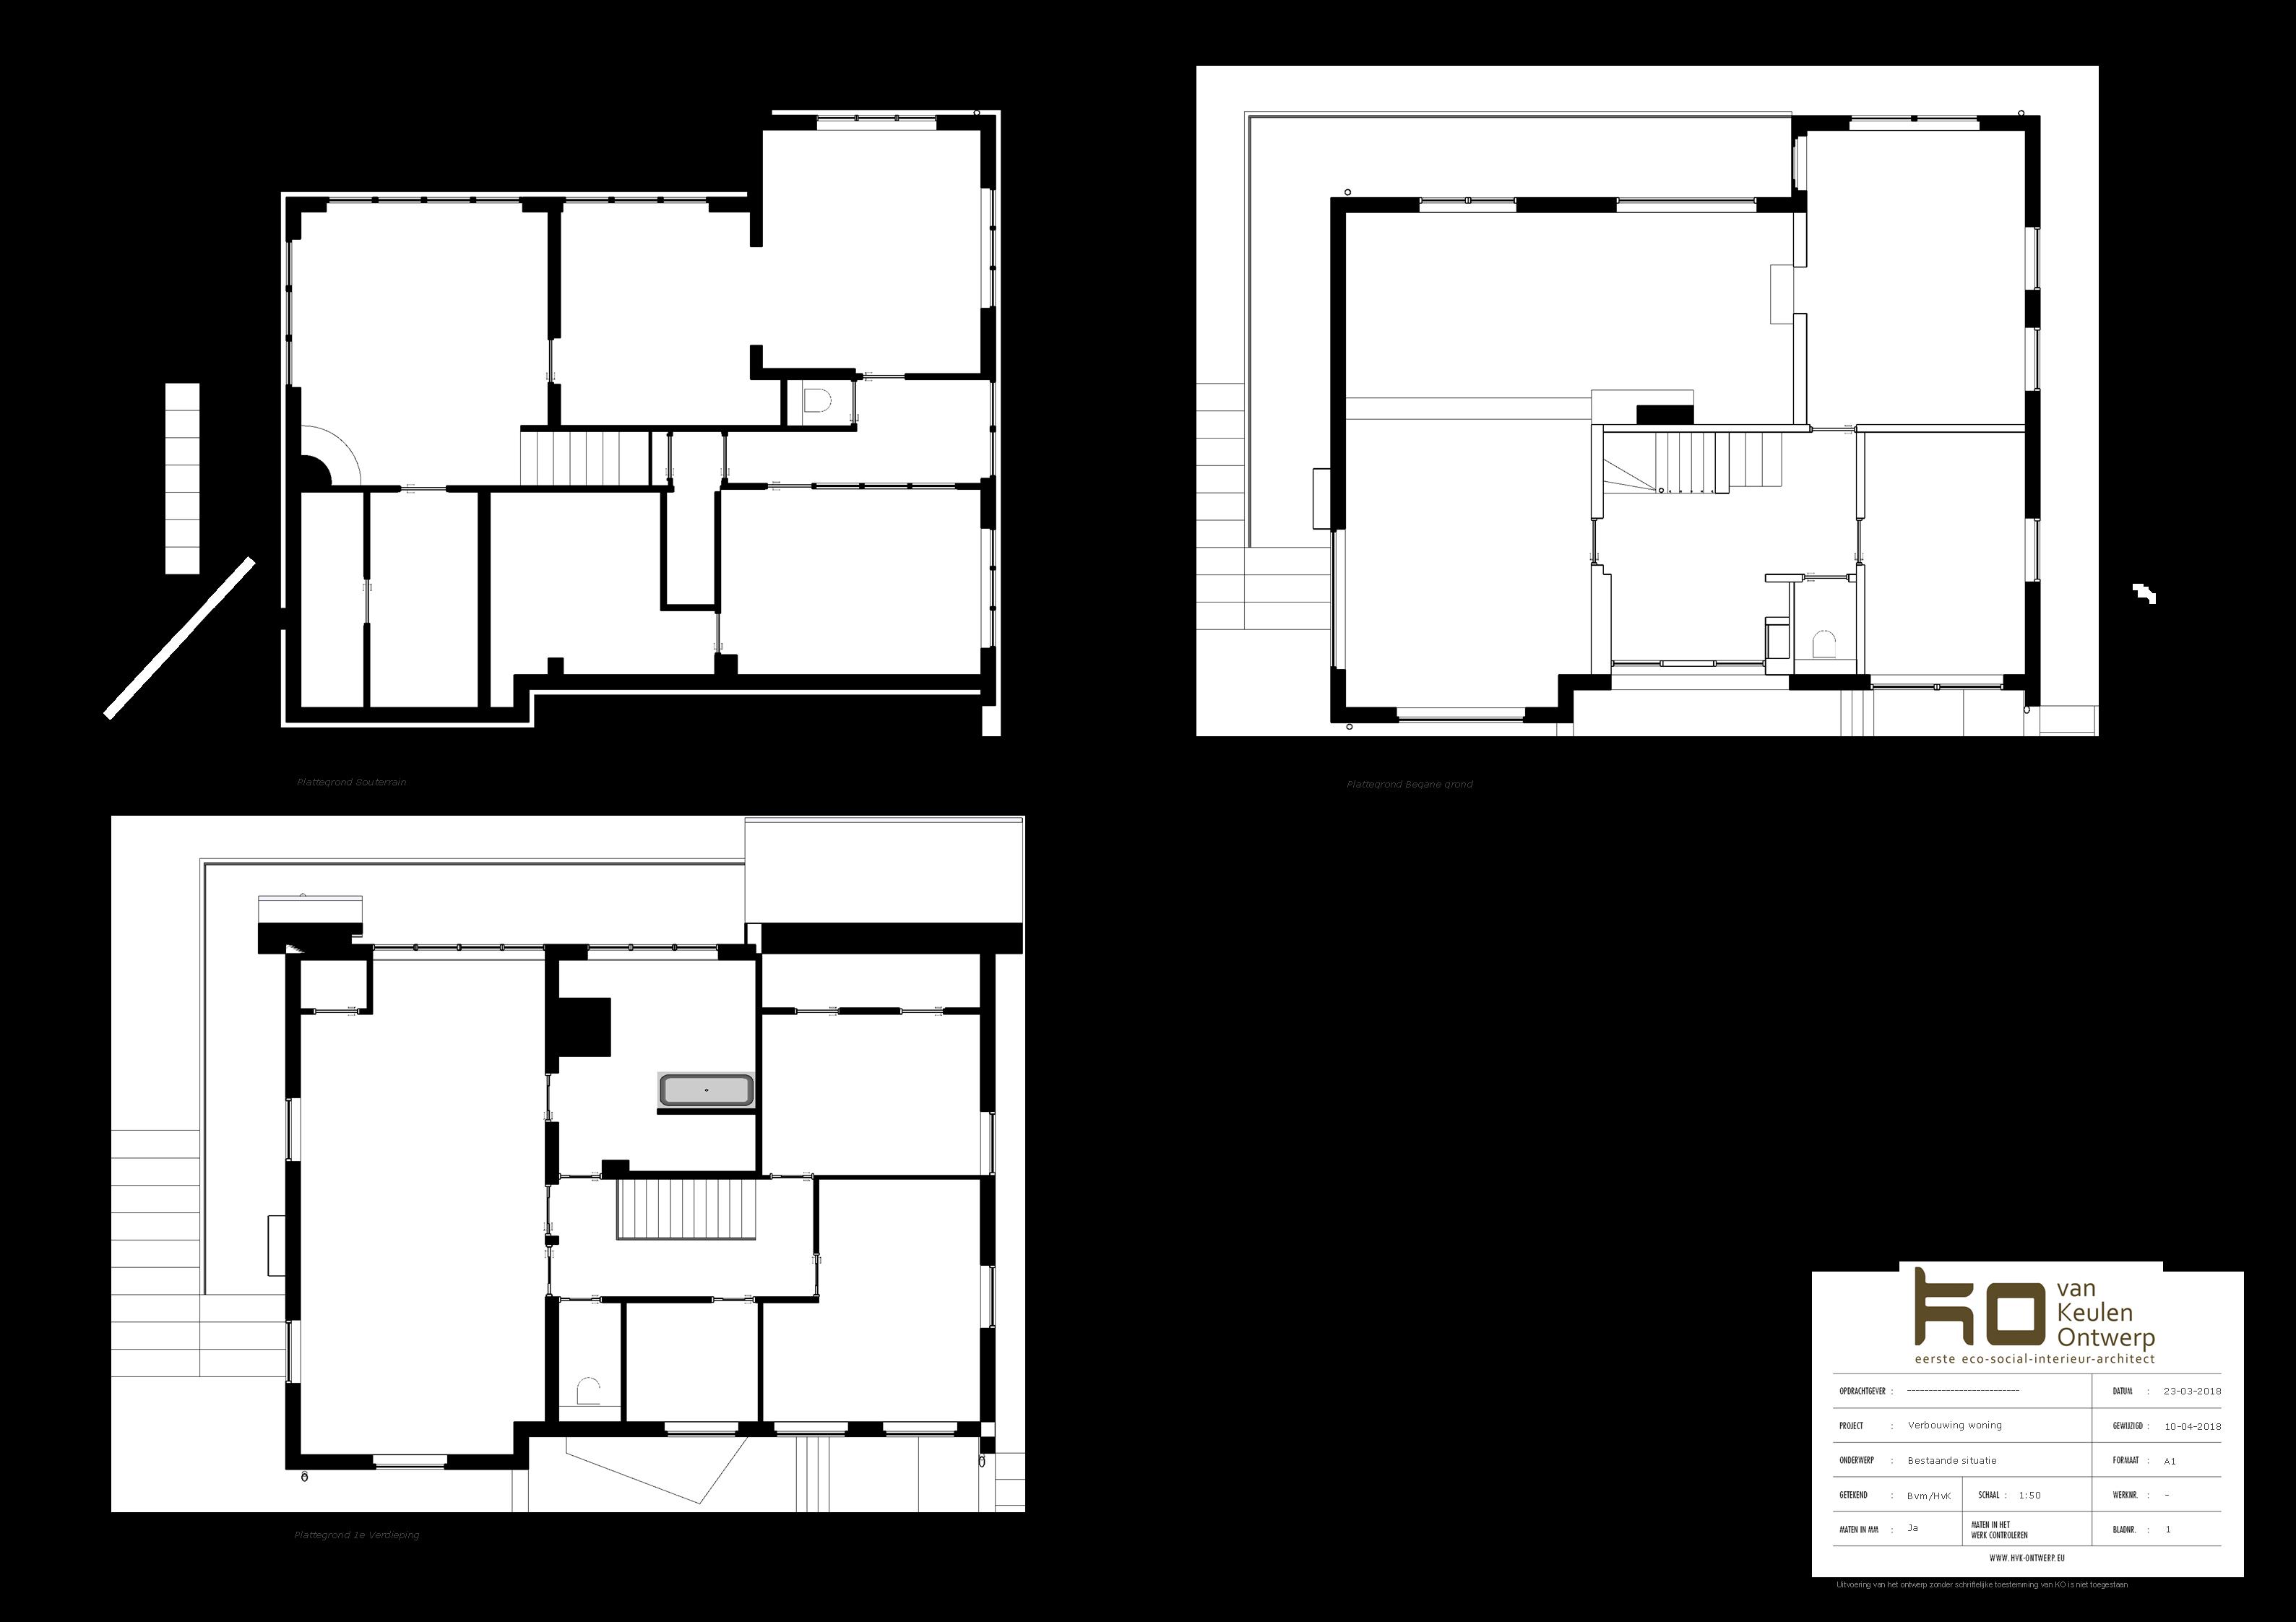 20180412 VO KO- -RT 10118 Huissen SITE_01